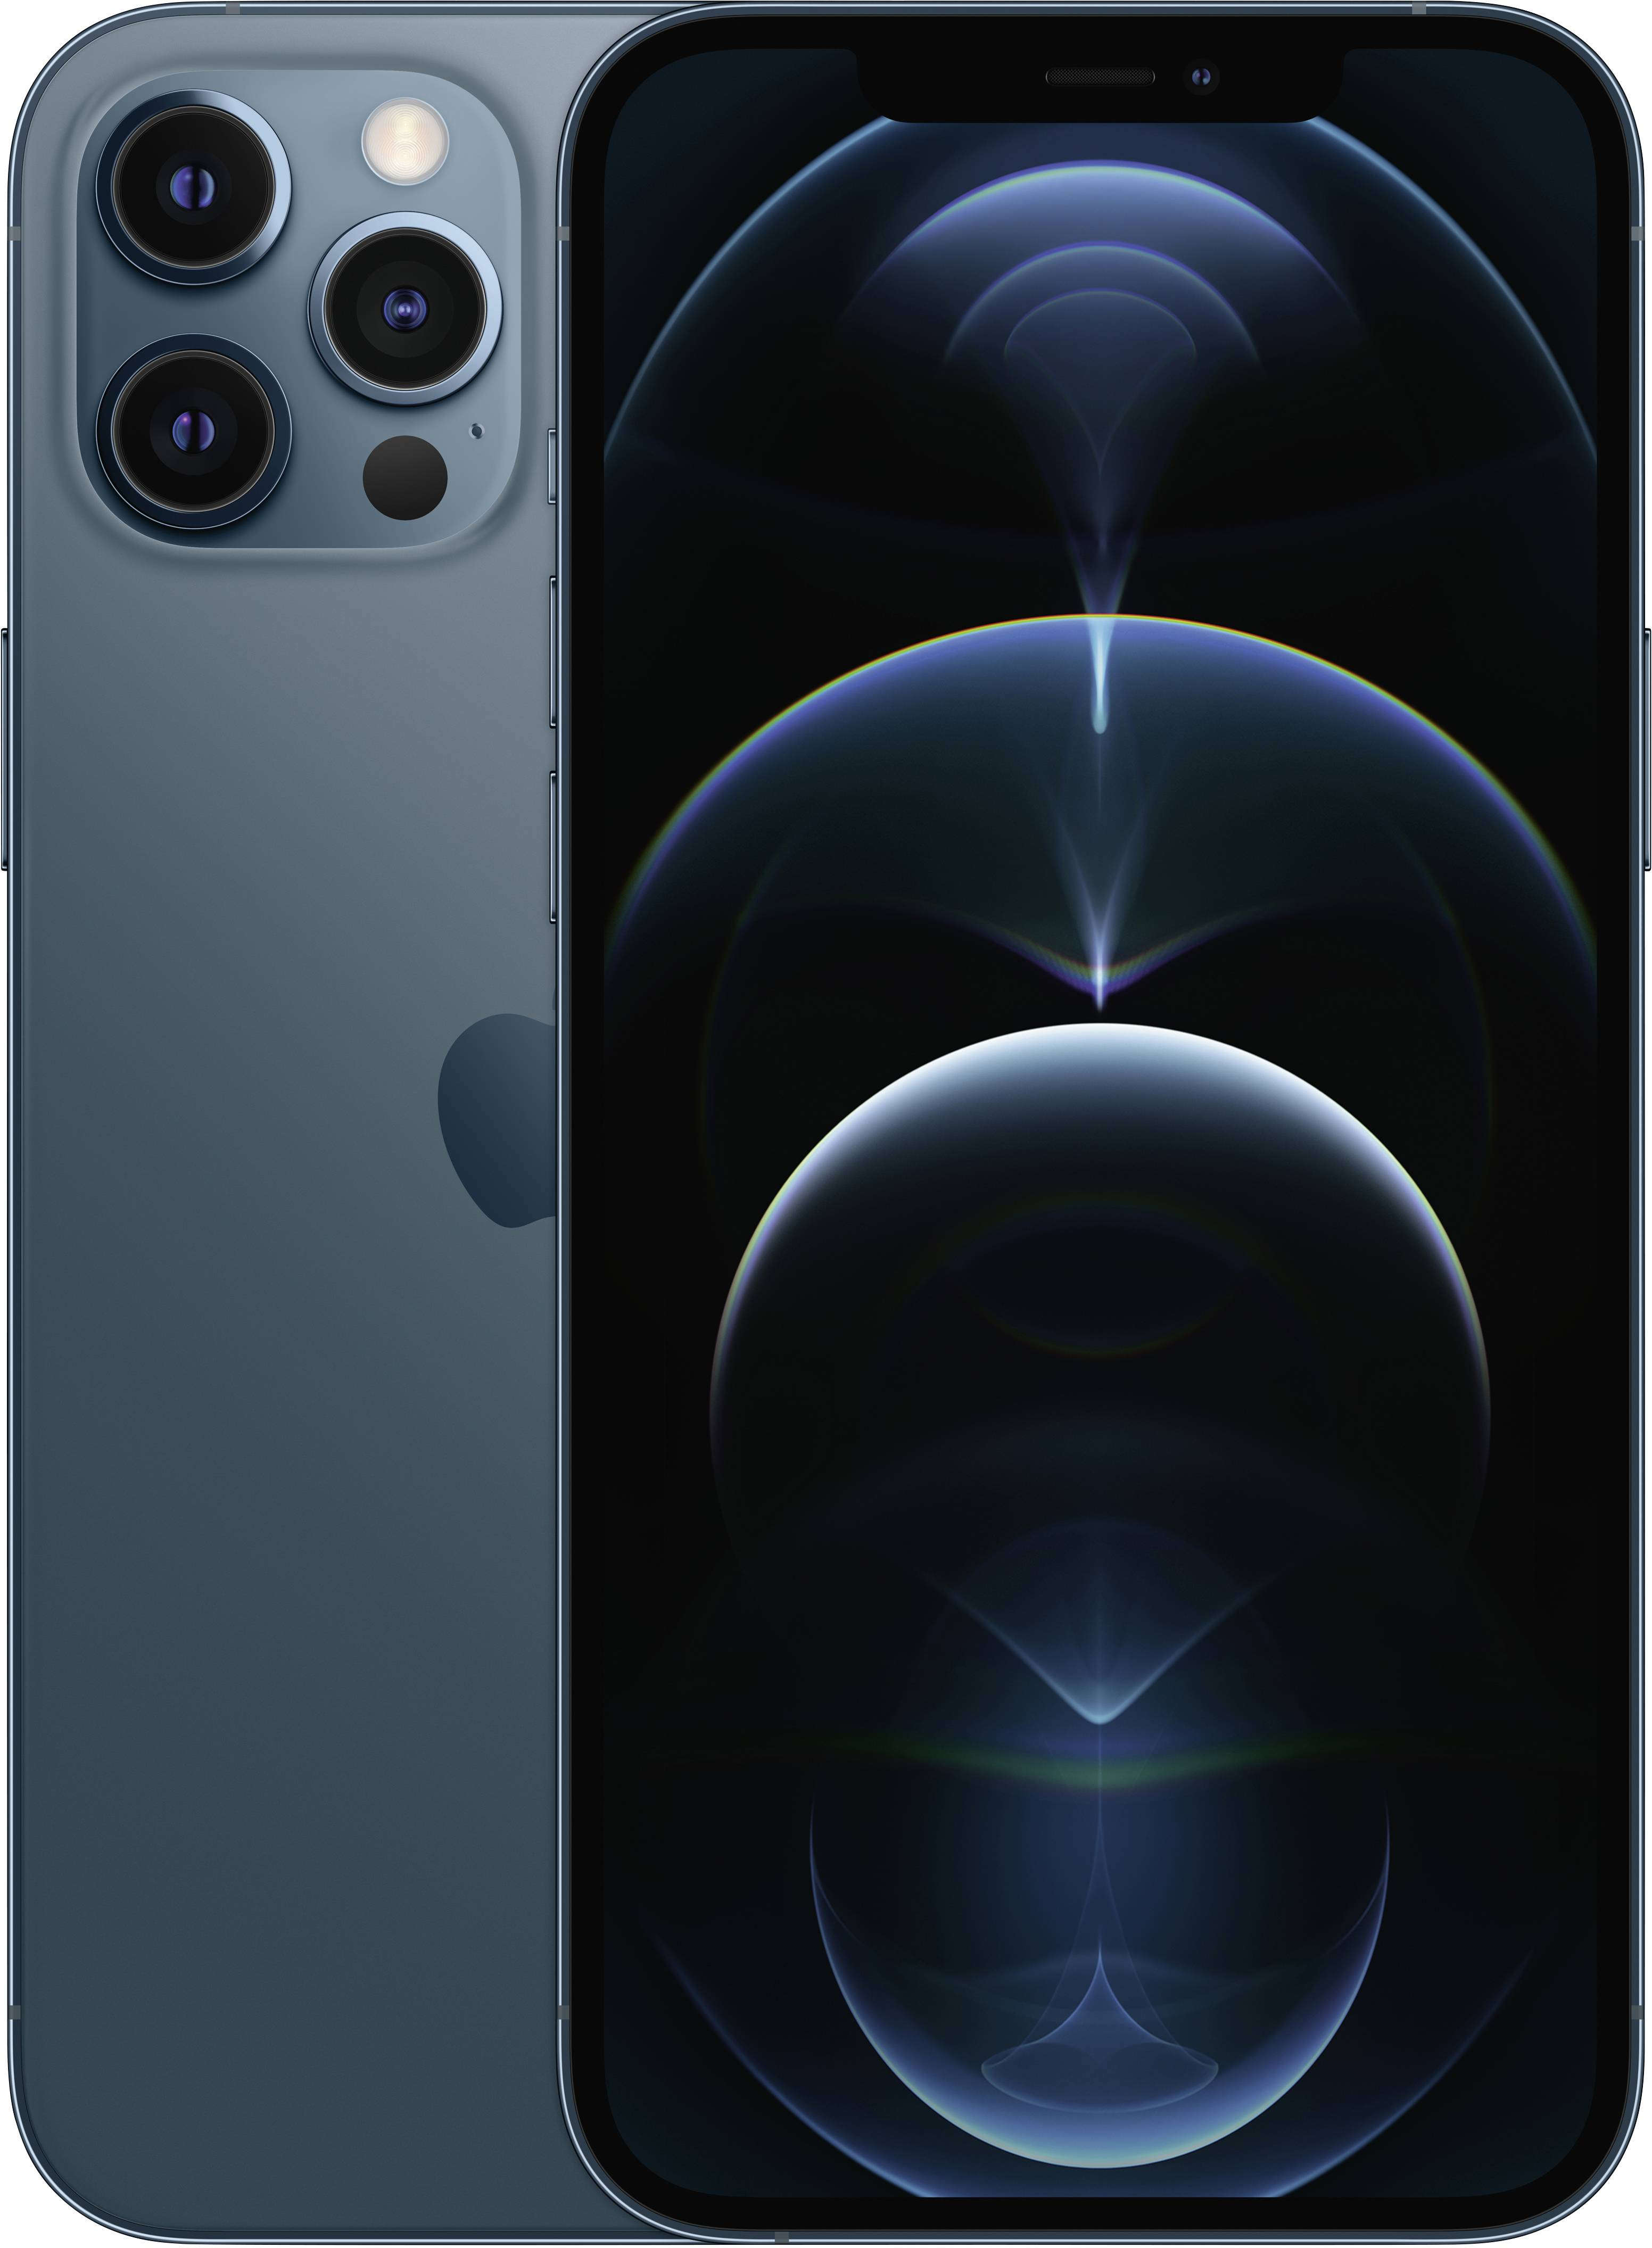 Apple iPhone 12 Pro Max iPhone 256 GB 6.7 inch (17 cm) Dual SIM iOS 14  Pacific blue